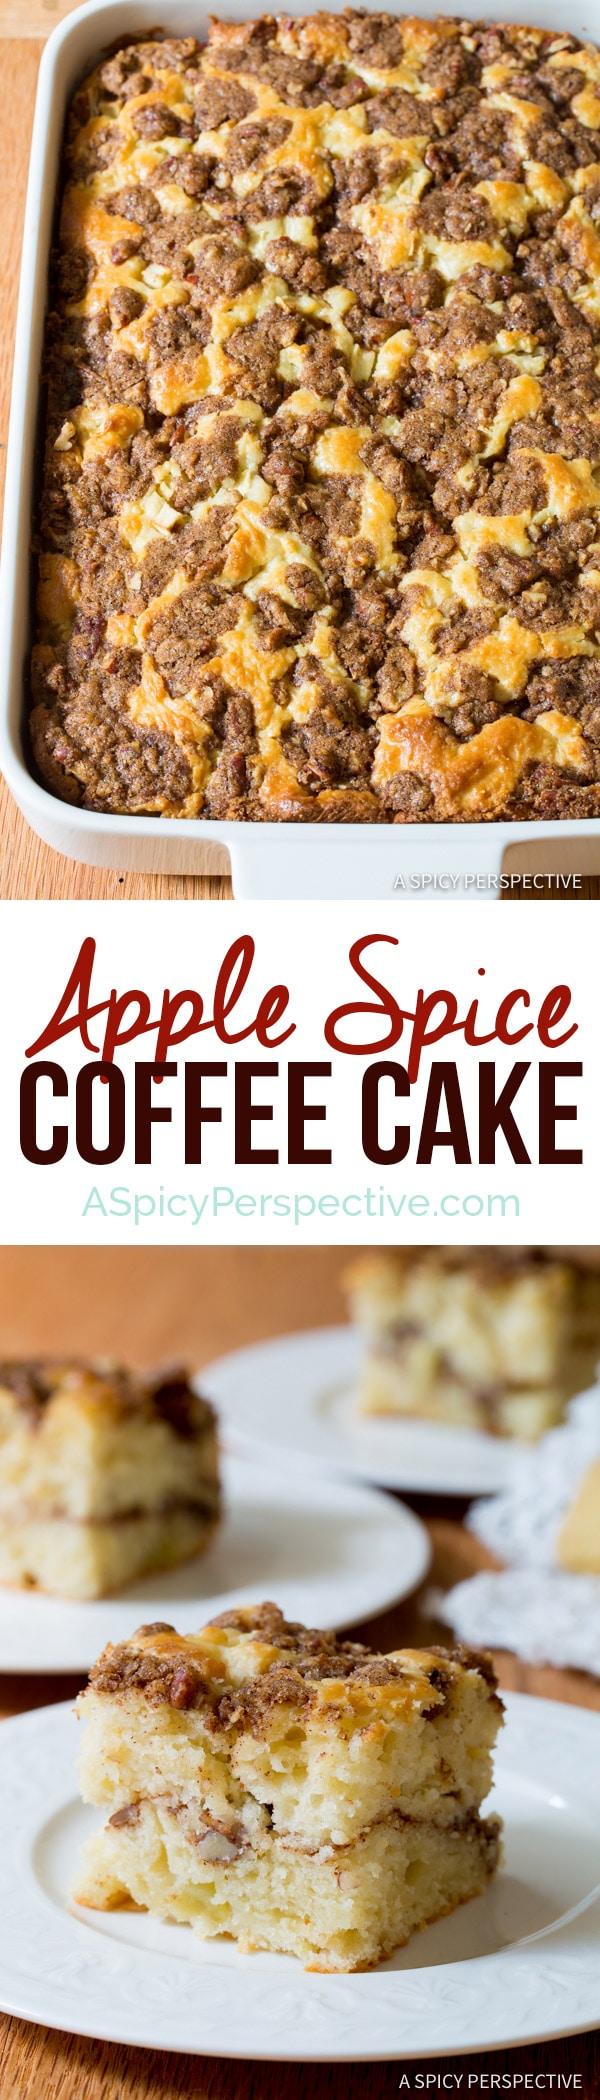 Apple Spice Coffee Cake | ASpicyPerspective.com